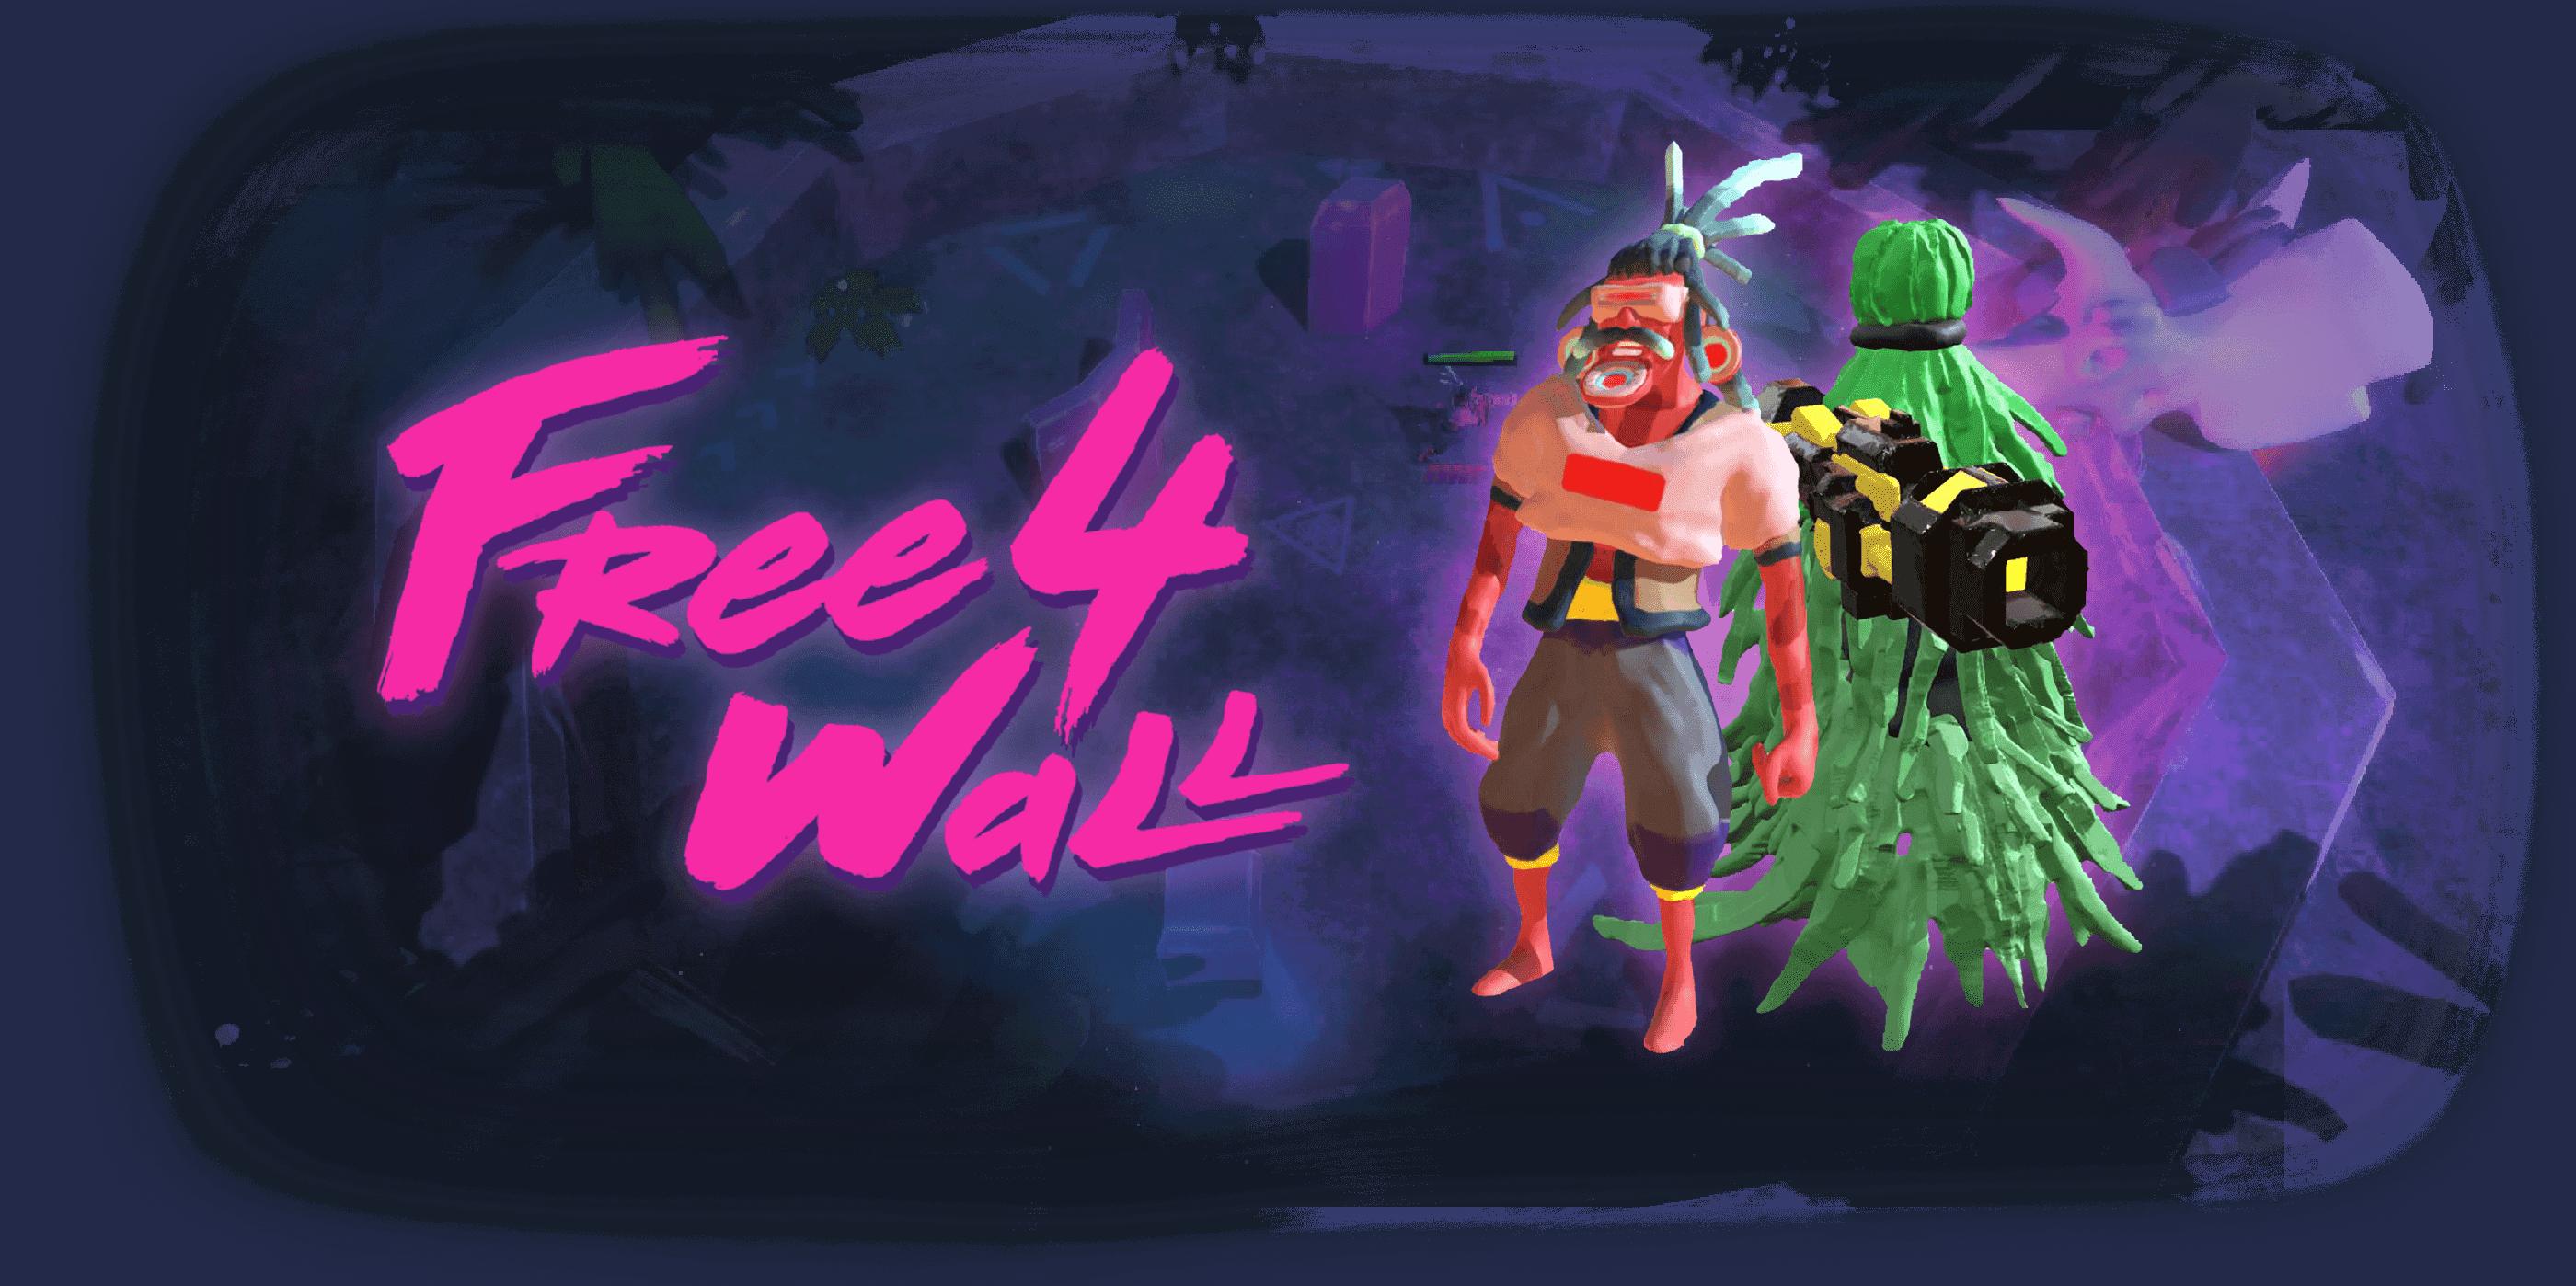 Free 4 Wall